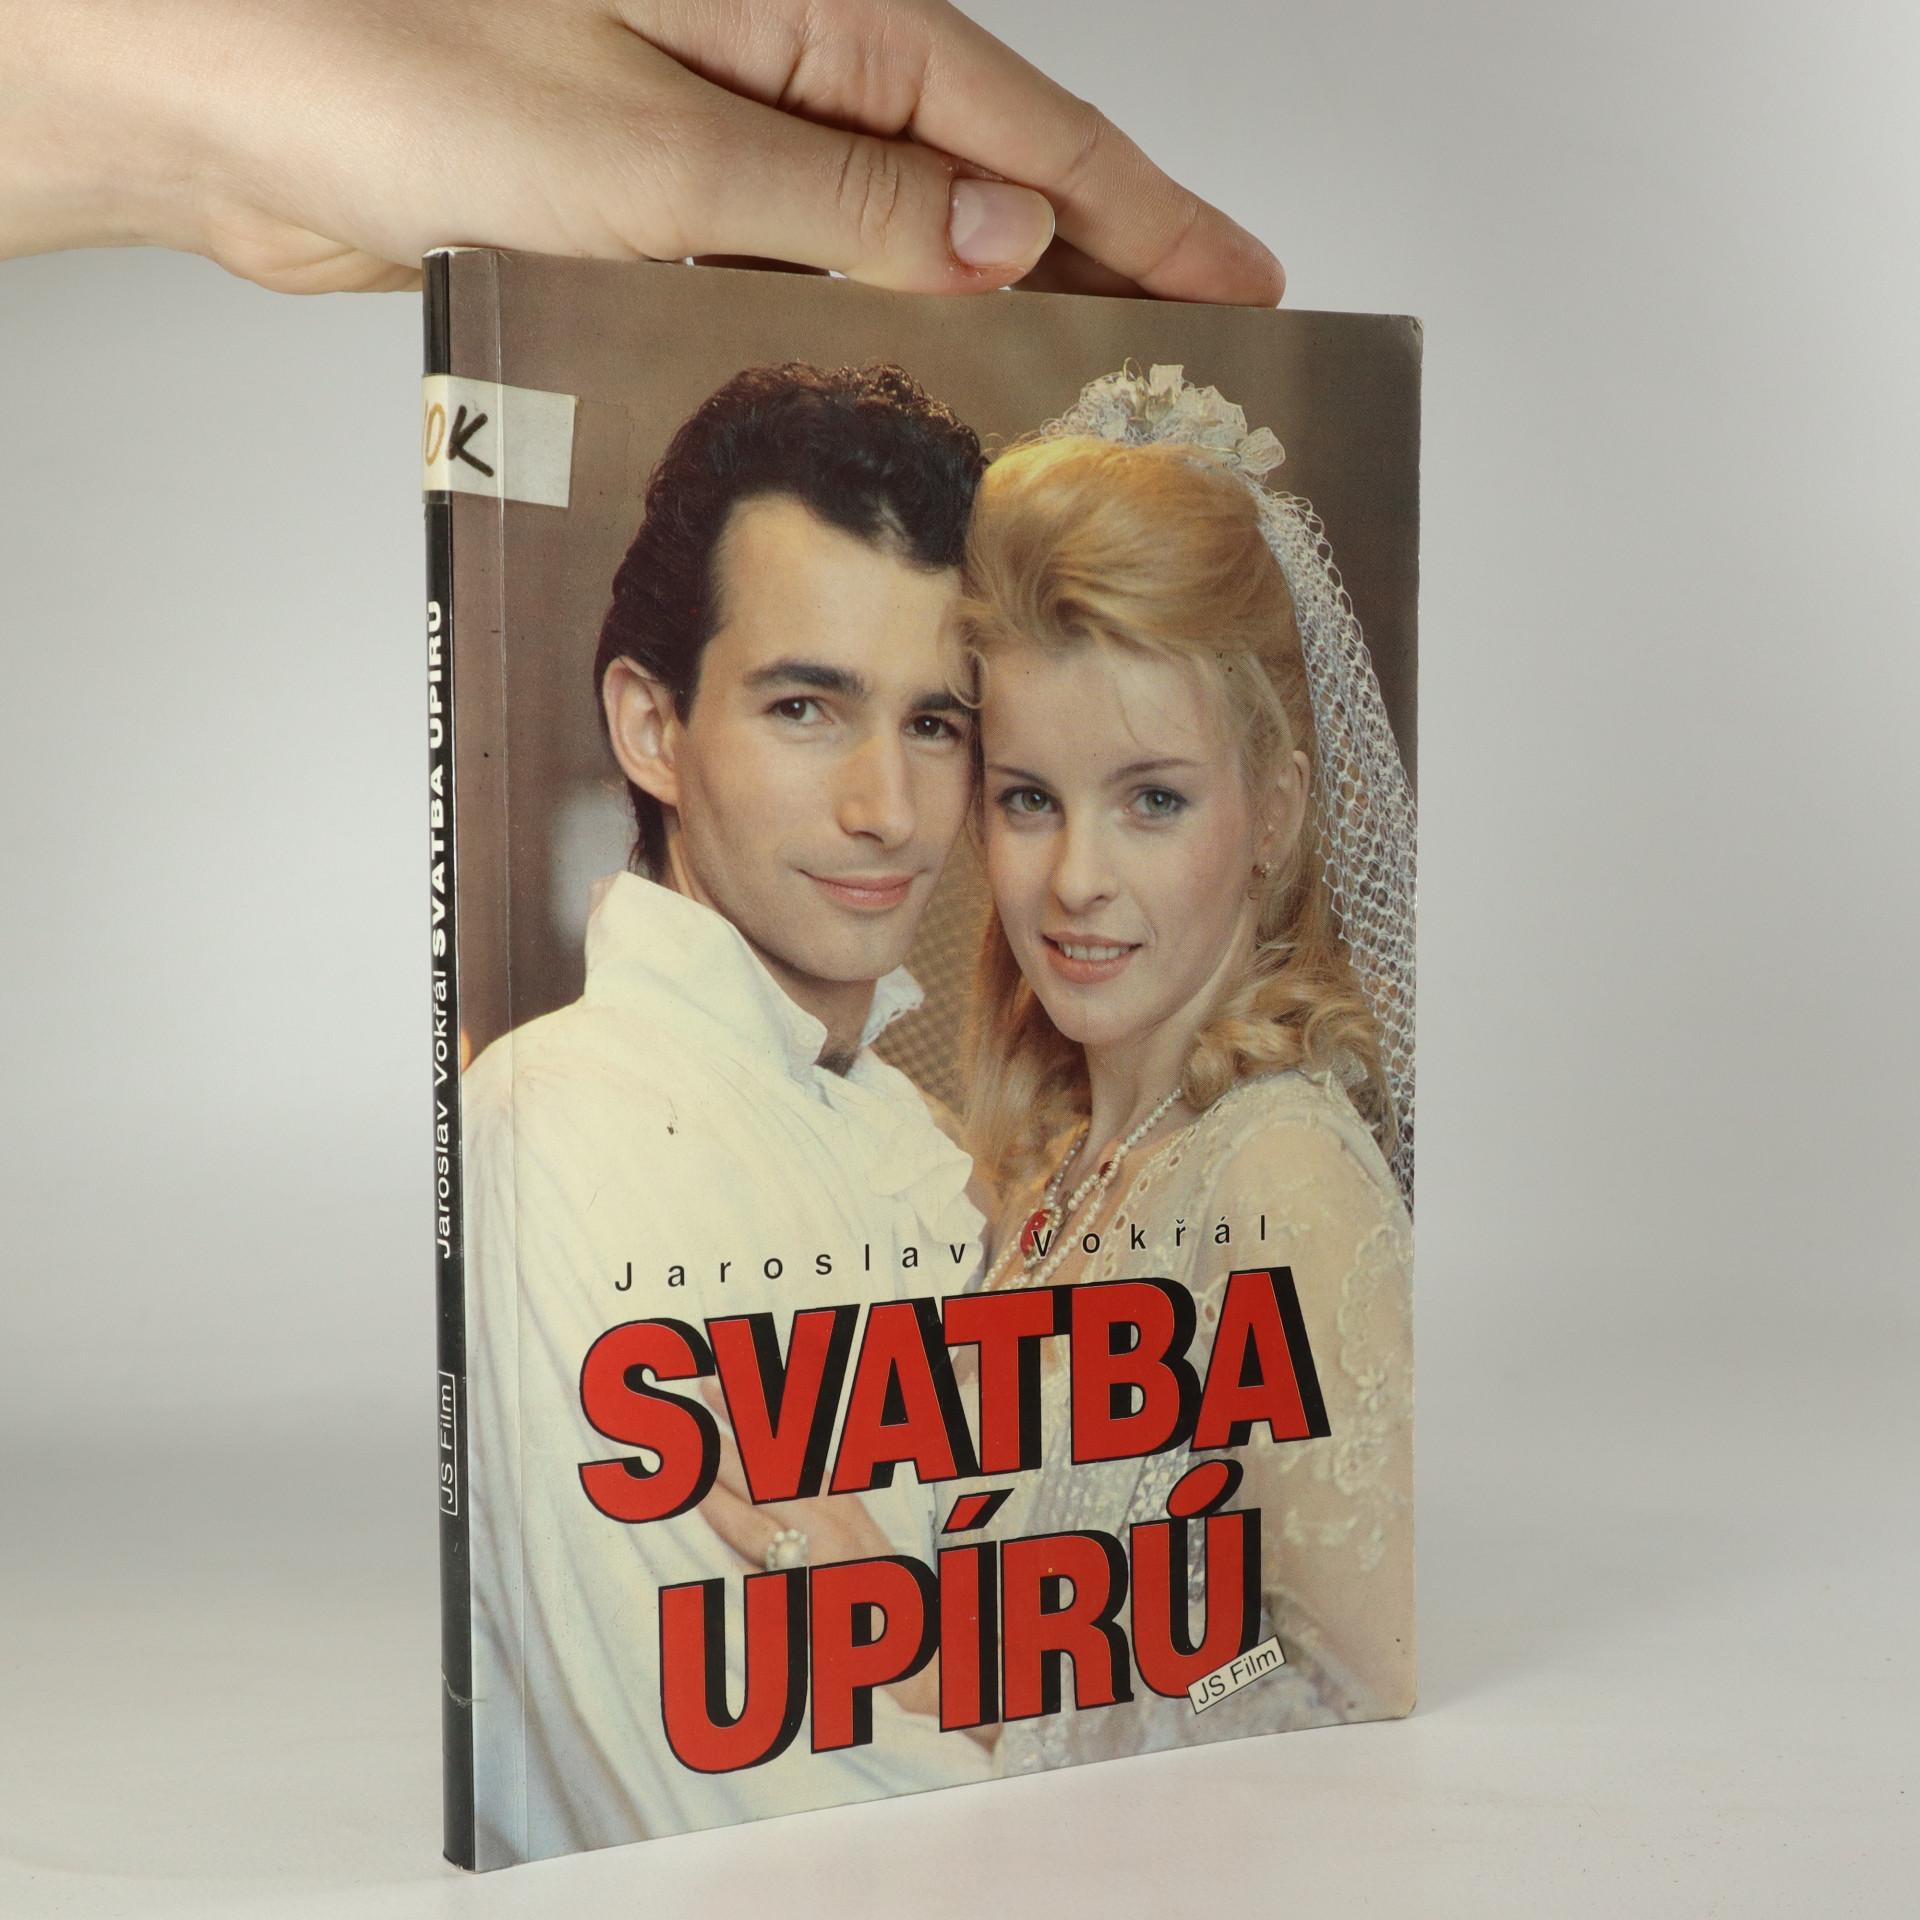 antikvární kniha Svatba upírů, 1993